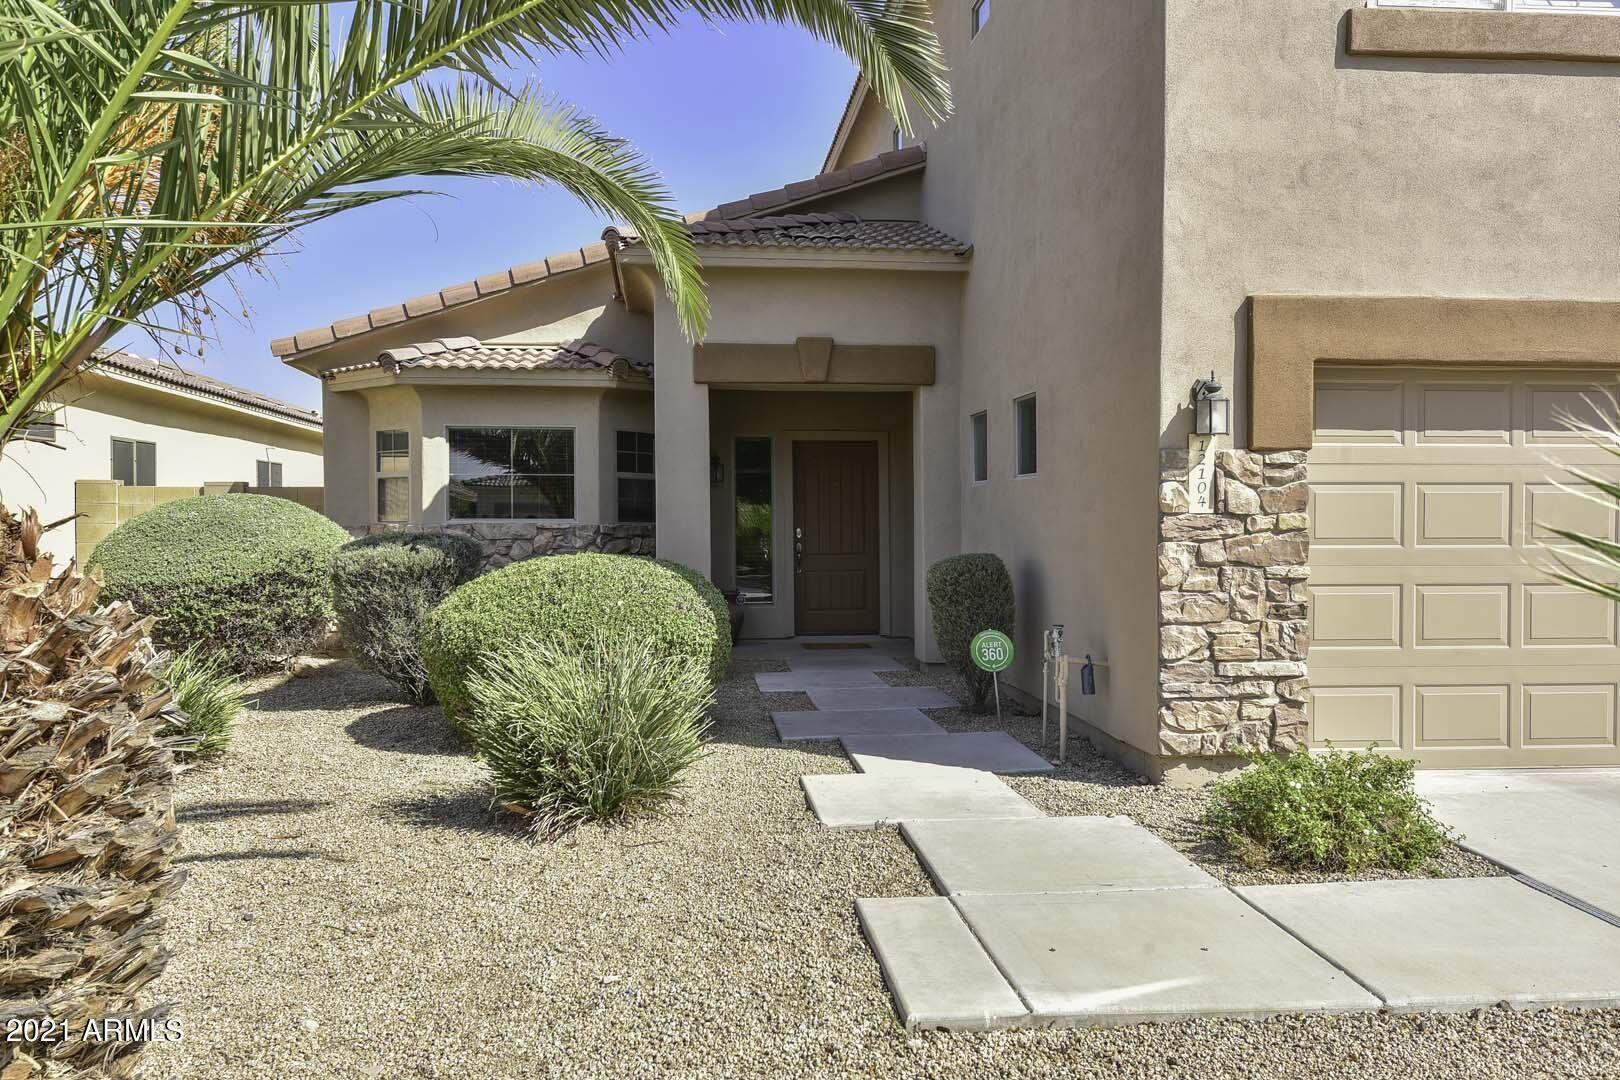 Photo of 12104 W IRONWOOD Street, El Mirage, AZ 85335 (MLS # 6295754)